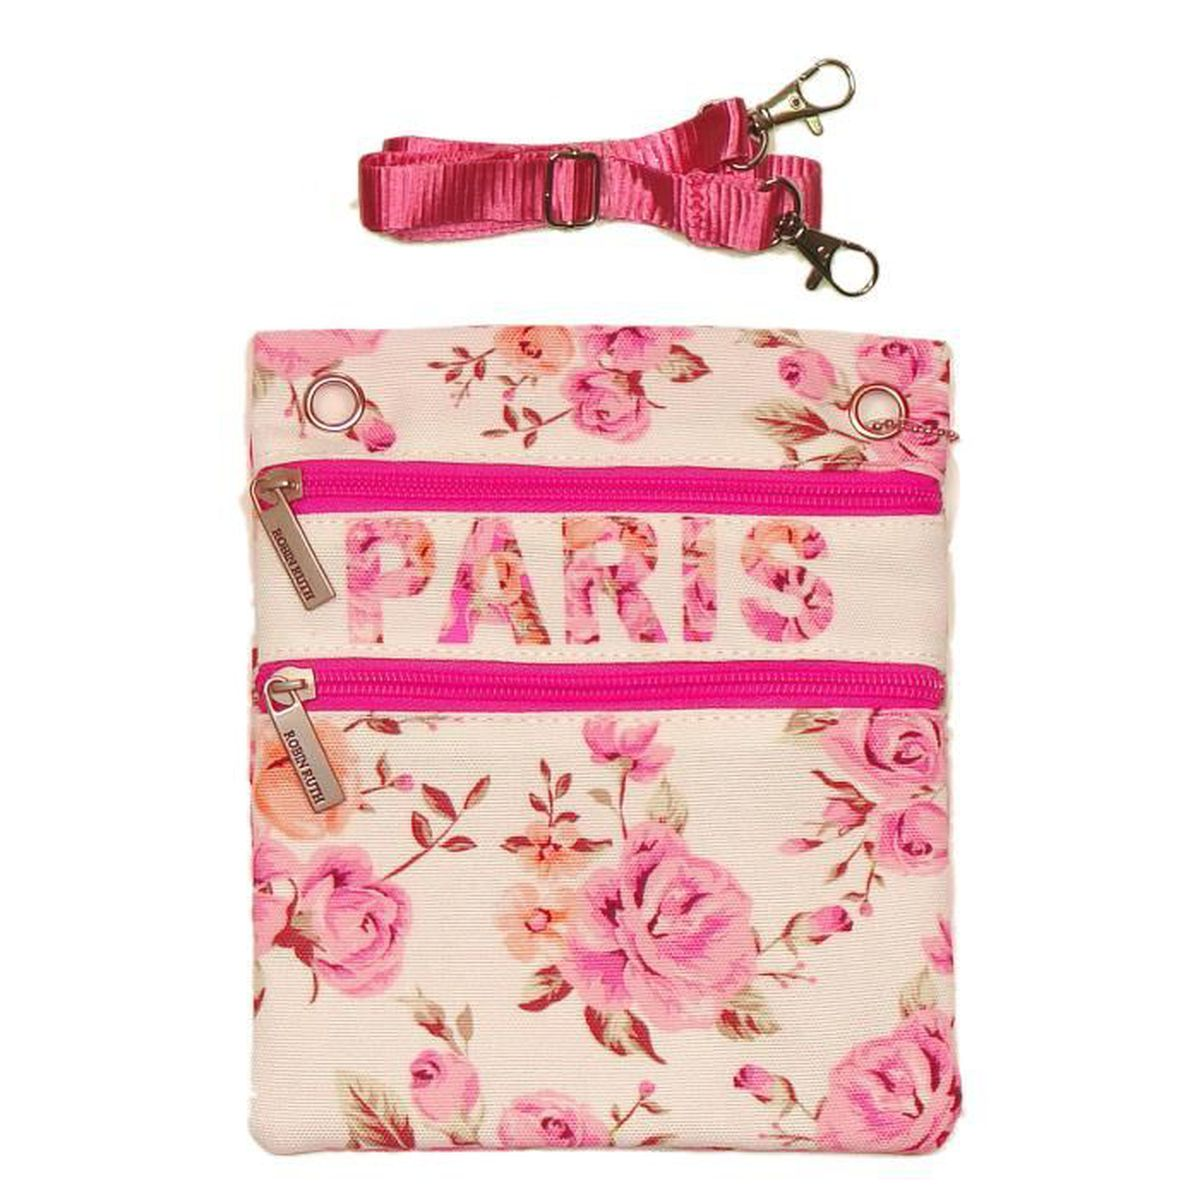 Rose Pochette Passeport Paris Robin Ruth